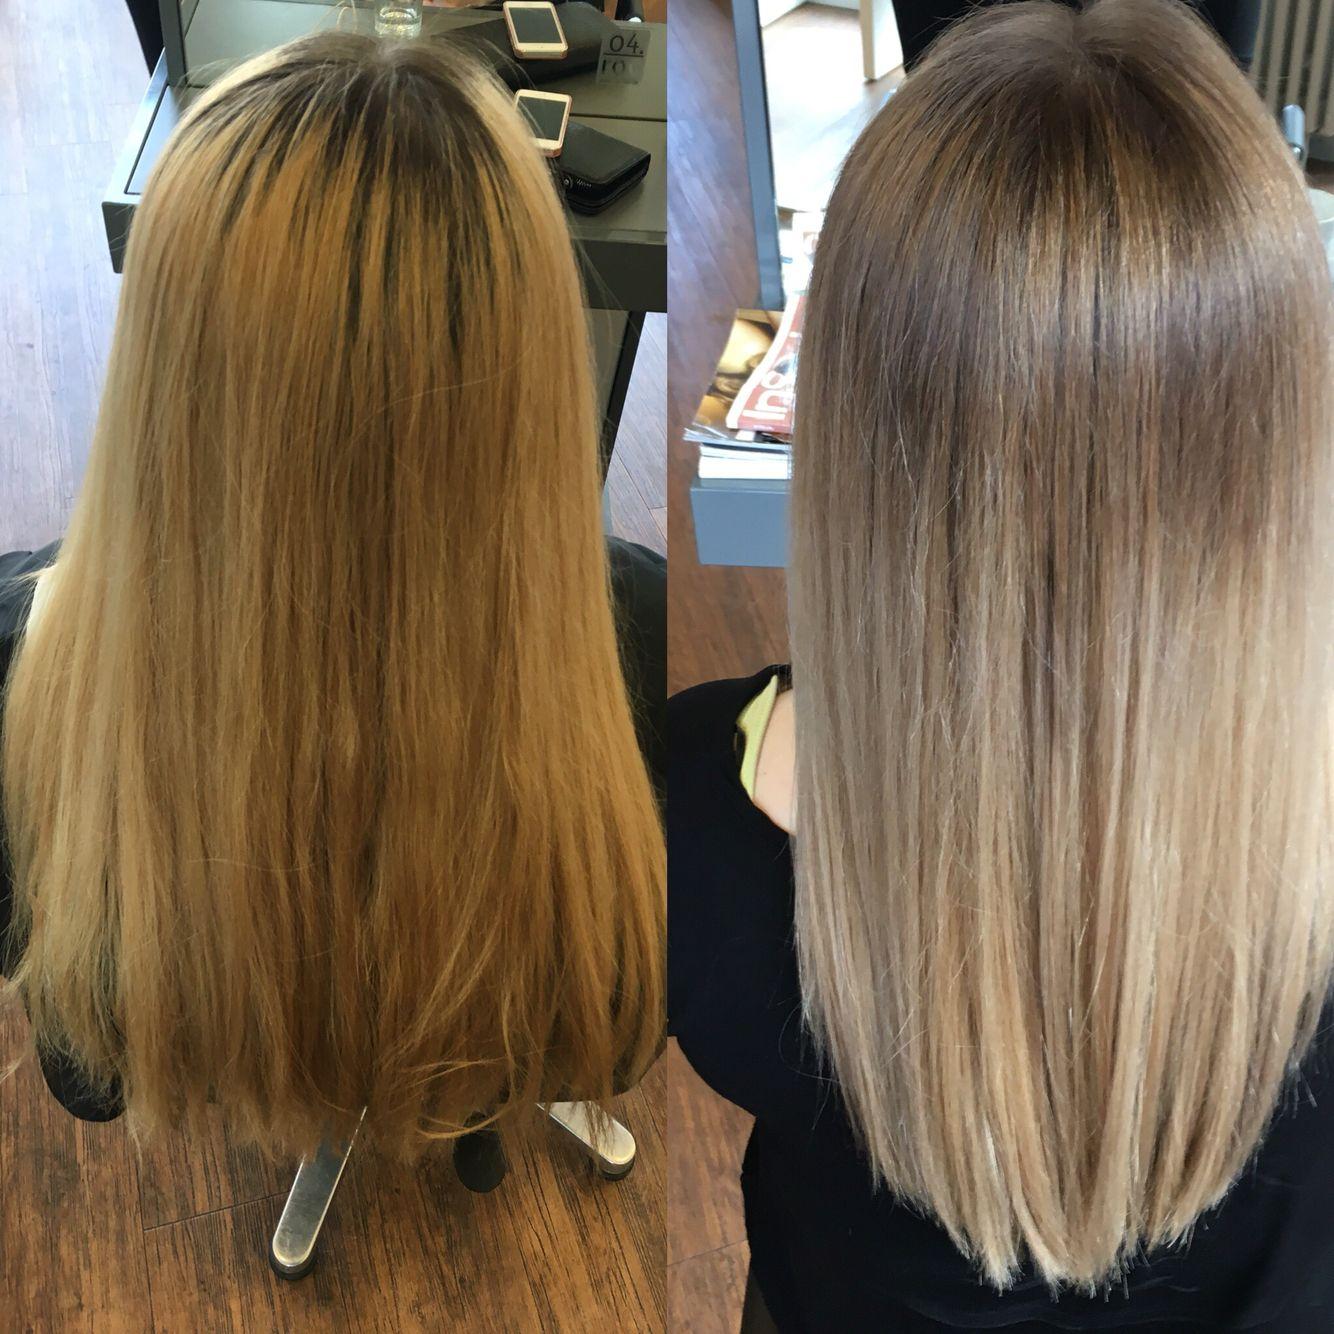 Ballayage Blond à olaplex loreal baleyage coolblonde blond no filter longhair vorher